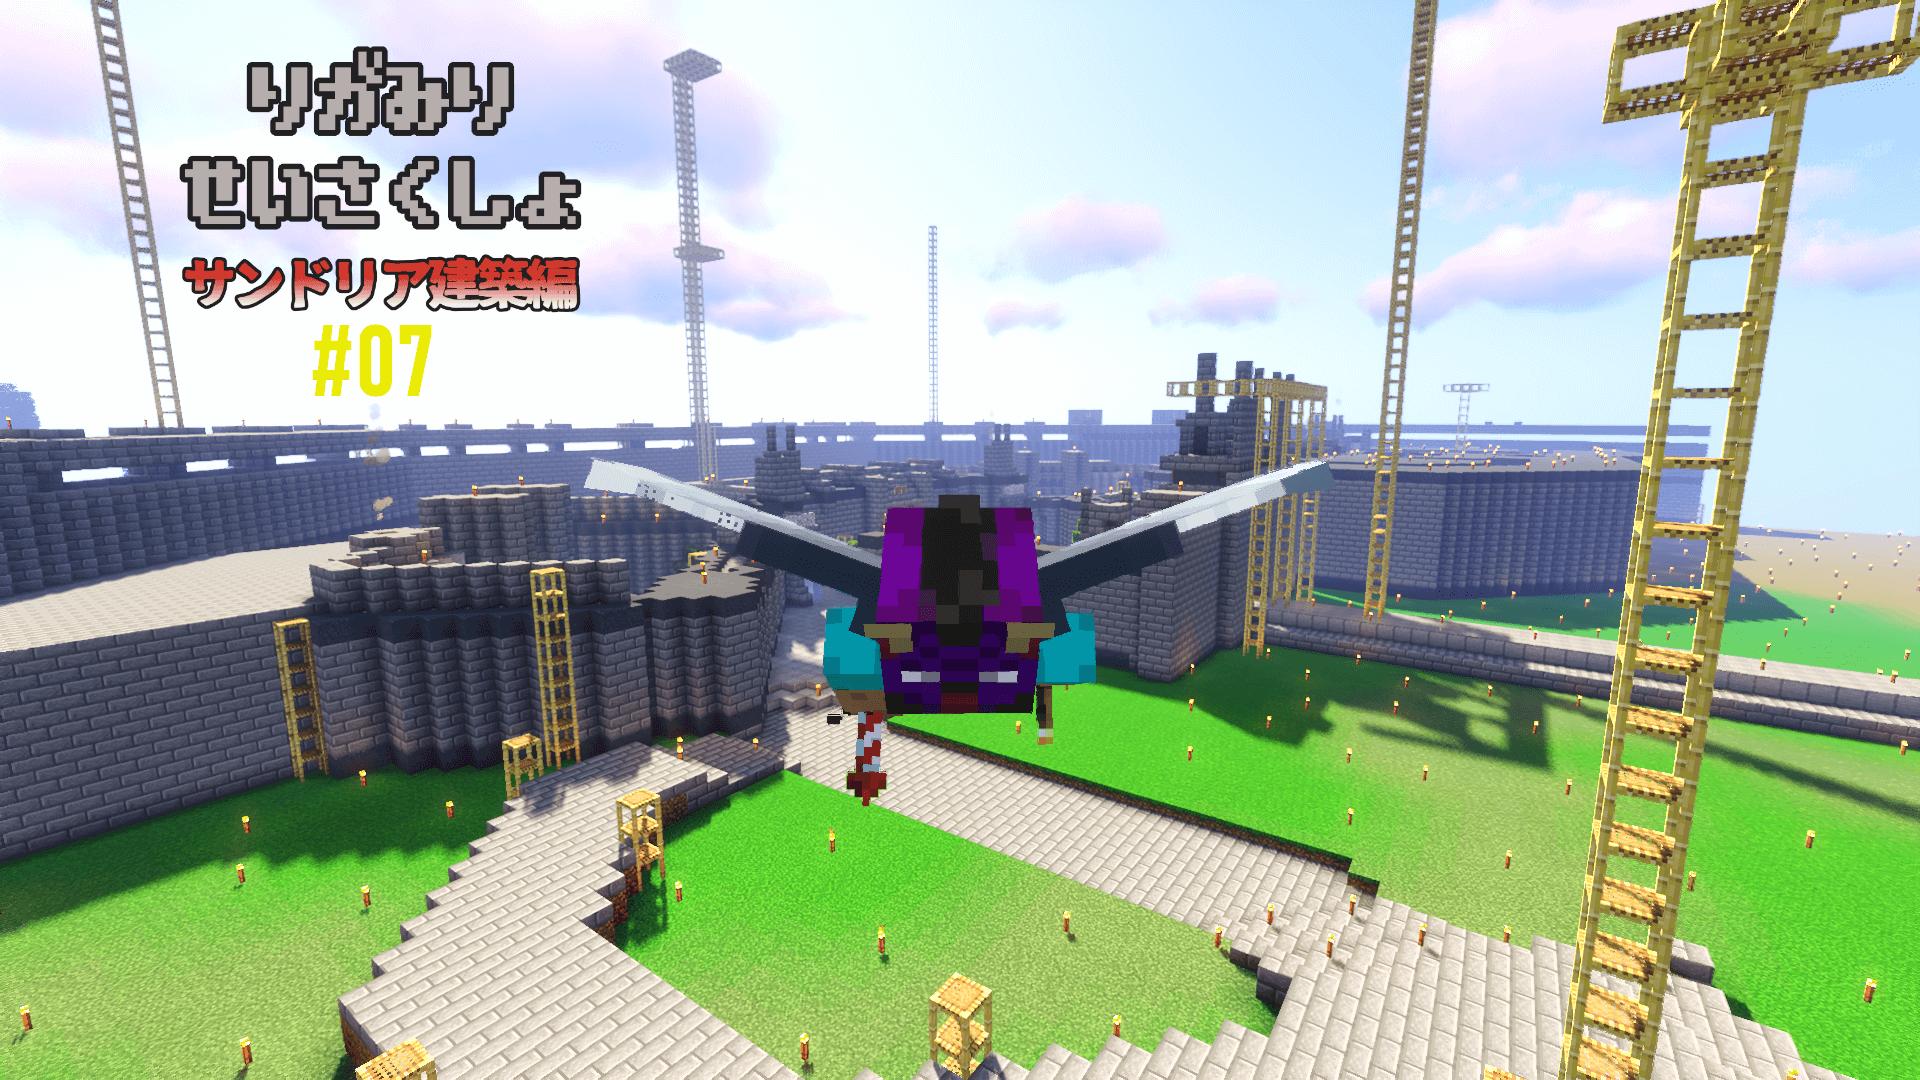 MinecraftRealms_thum07.png